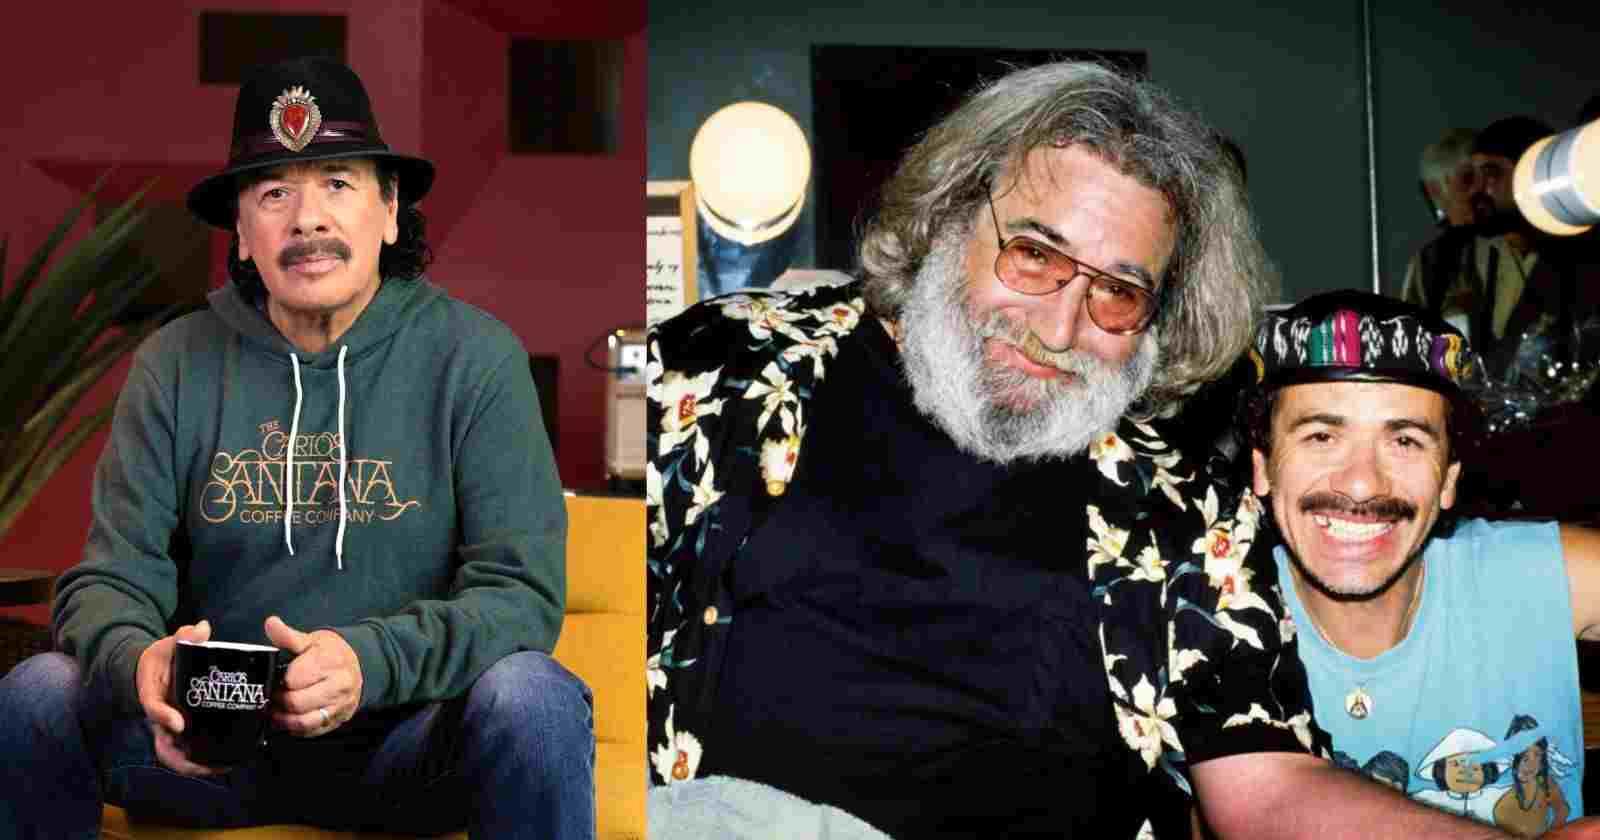 Carlos Santana's favorite funny memory of Woodstock with Jerry Garcia